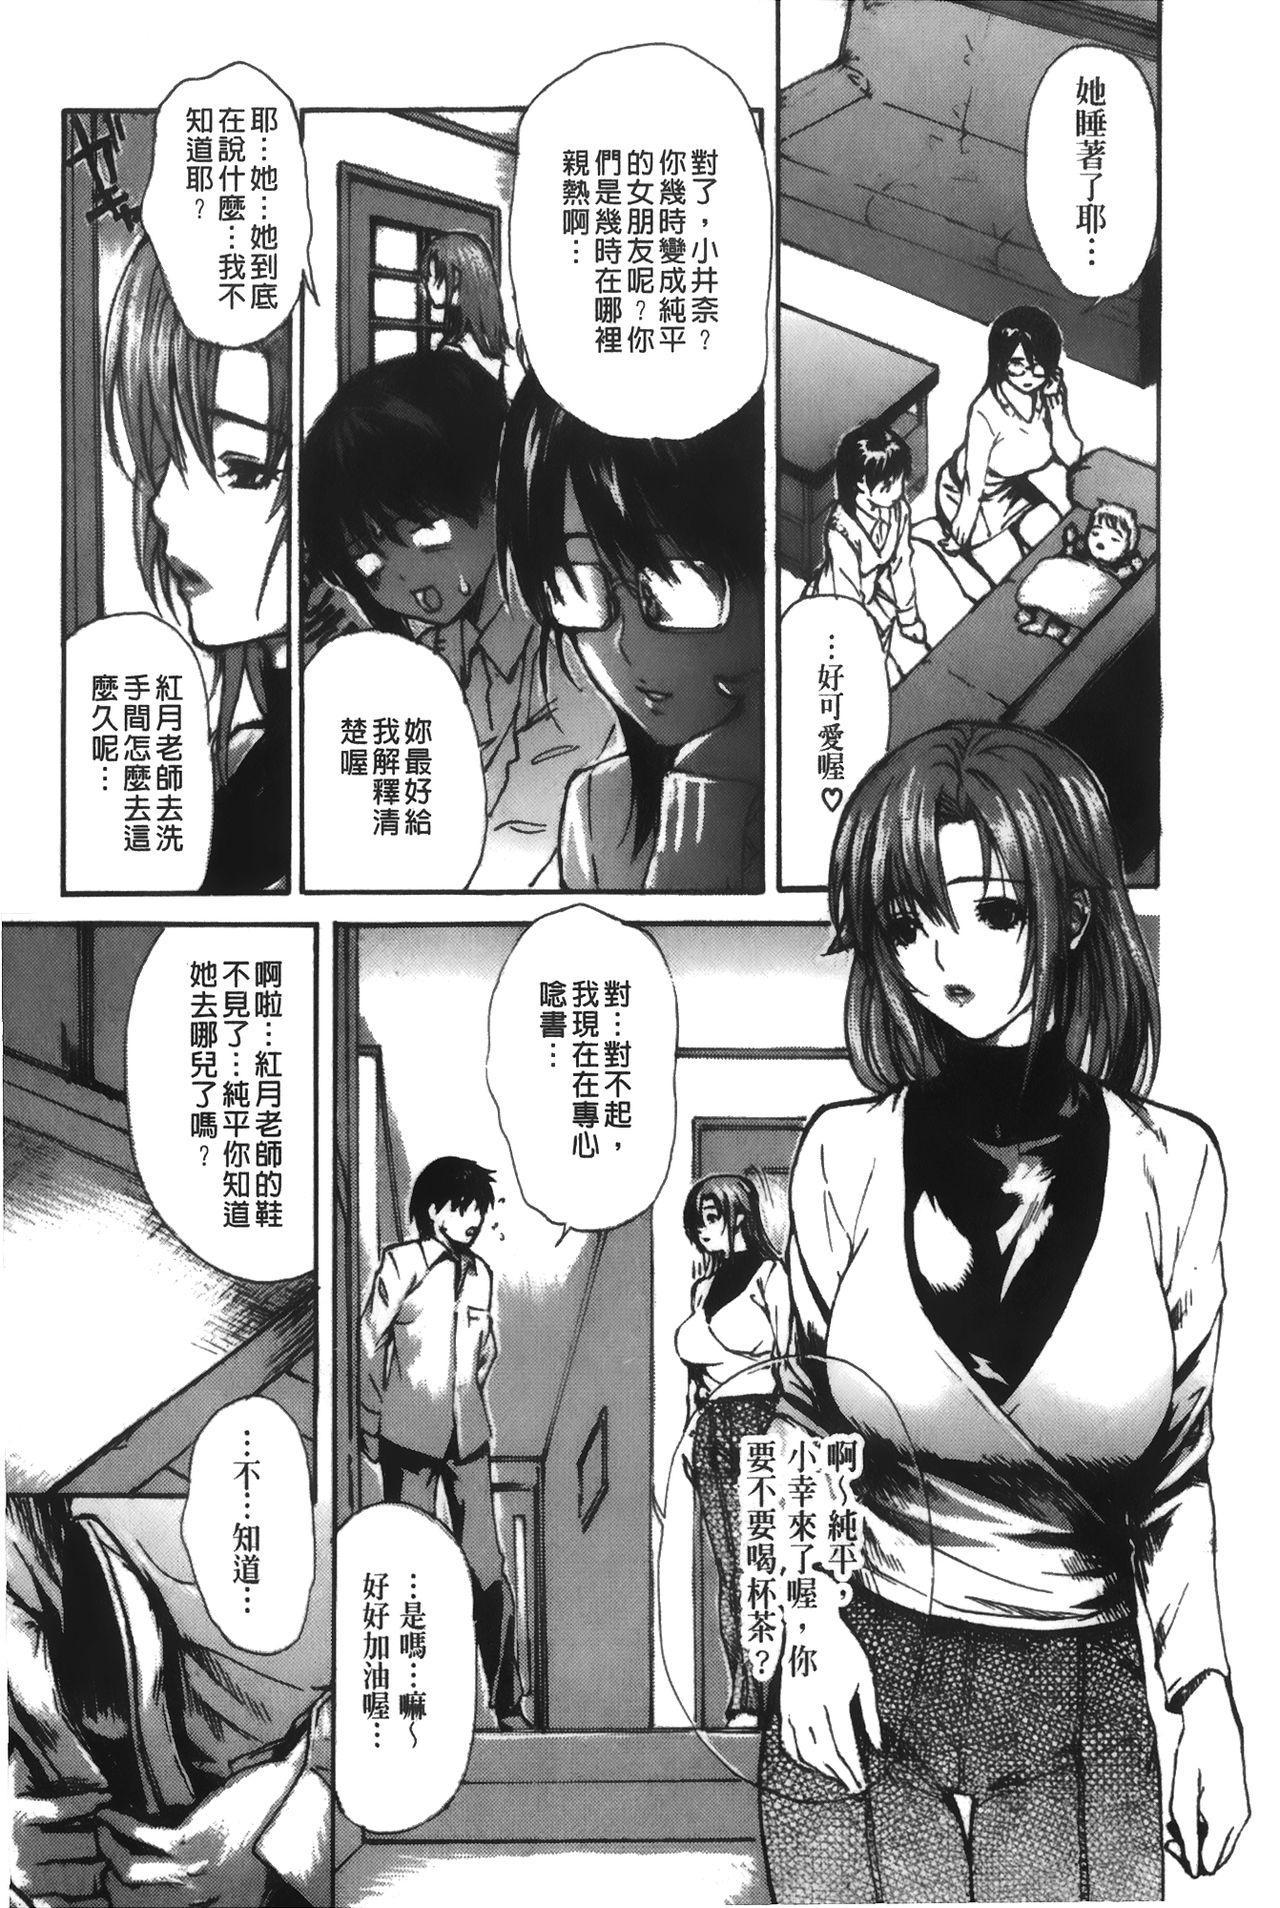 Tonari no Minano Sensei 4 | 隔壁的美奈乃老師 4 102